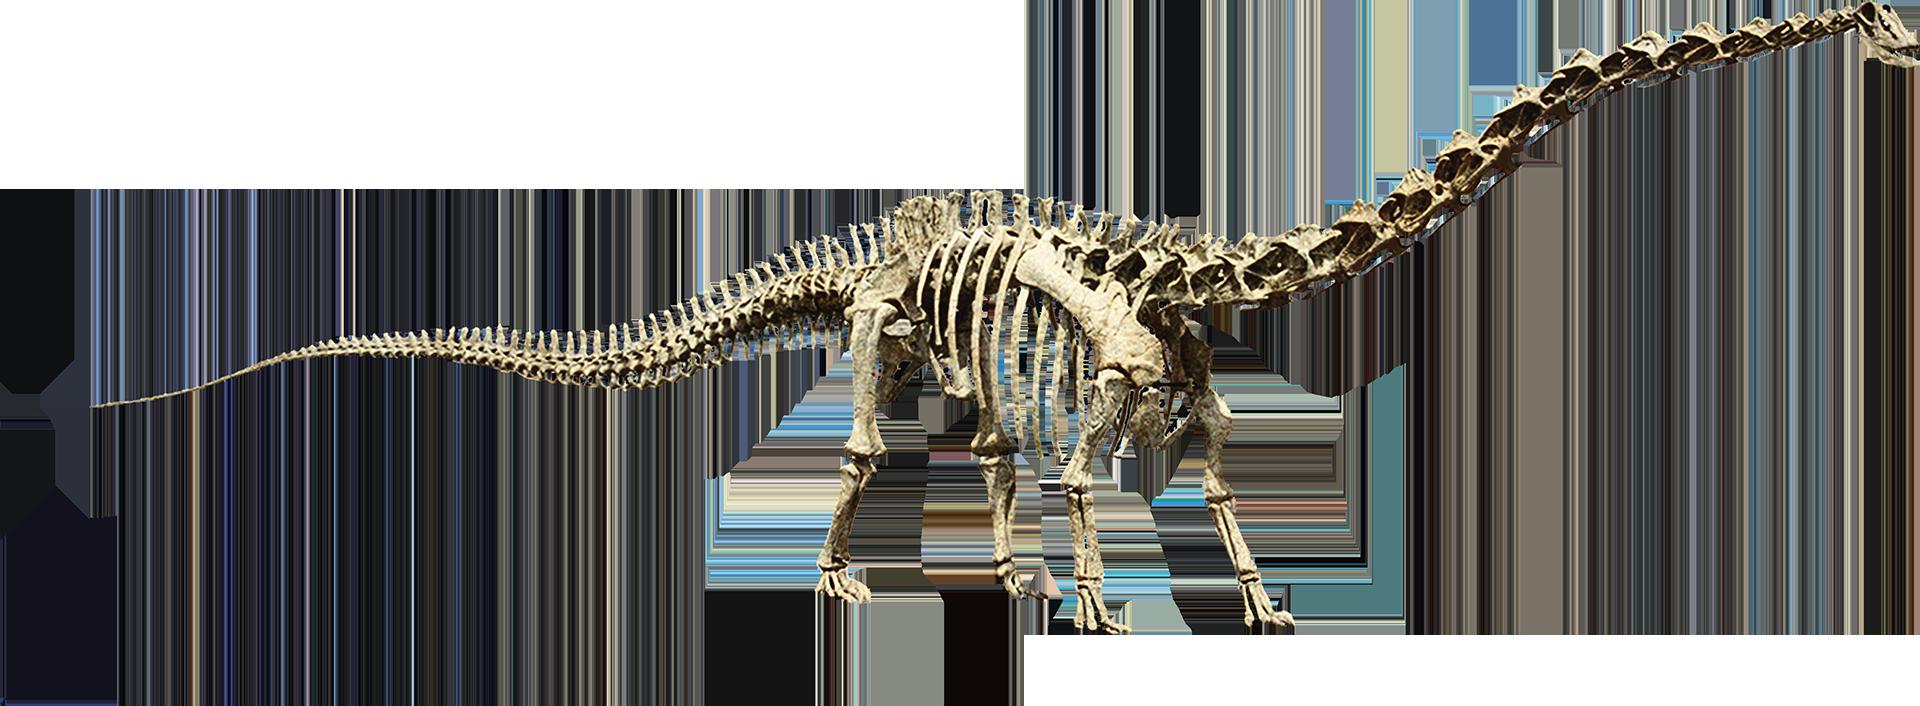 Seismosaurusclean Png 1920 706 Dinosaur Skeleton Dinosaur Skull